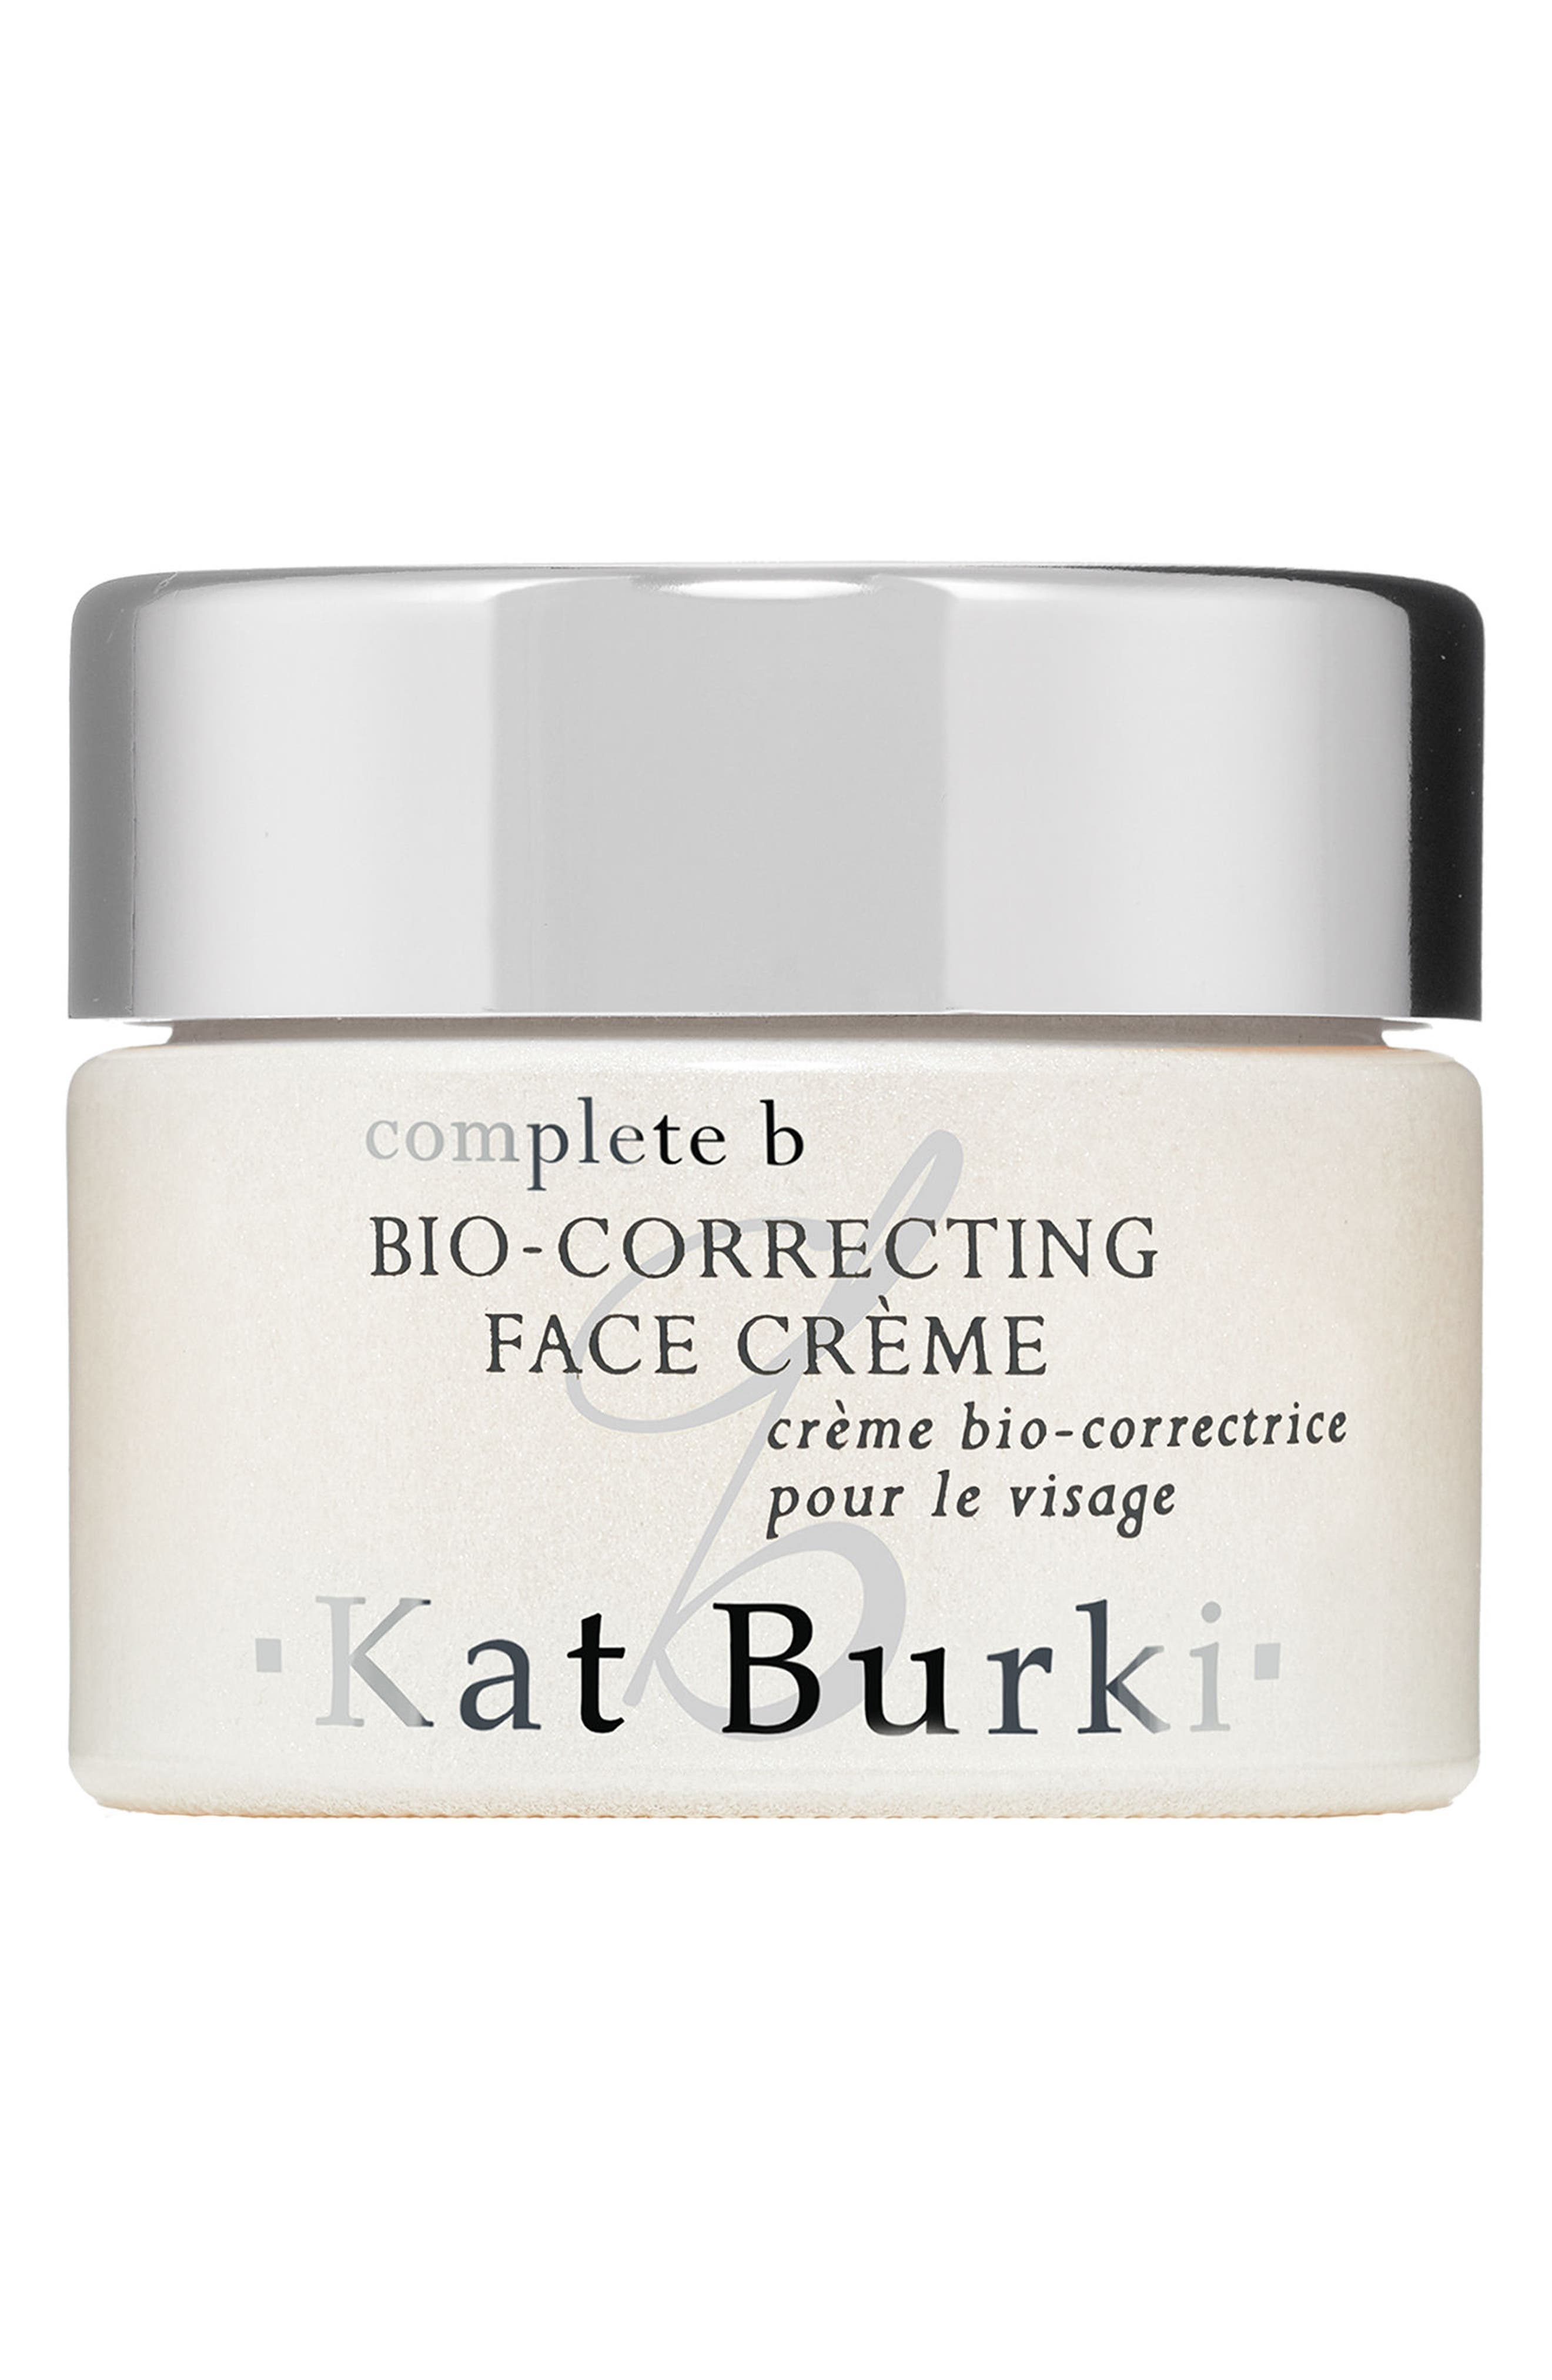 SPACE.NK.apothecary Kat Burki Complete B Bio-Correcting Face Crème